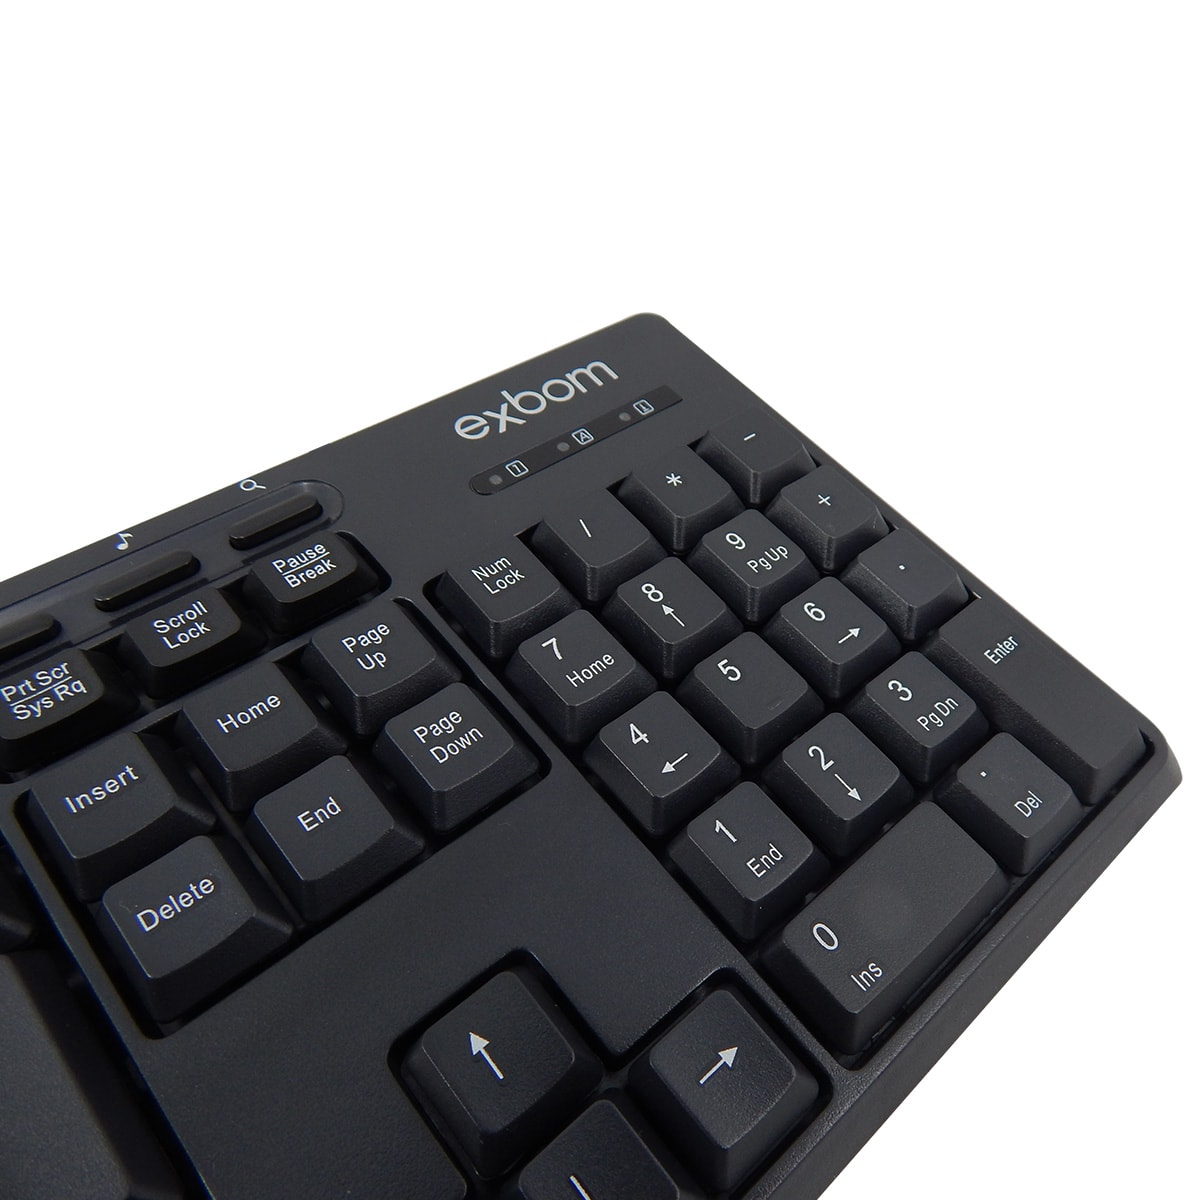 Teclado Multimidia USB Exbom BK-140M